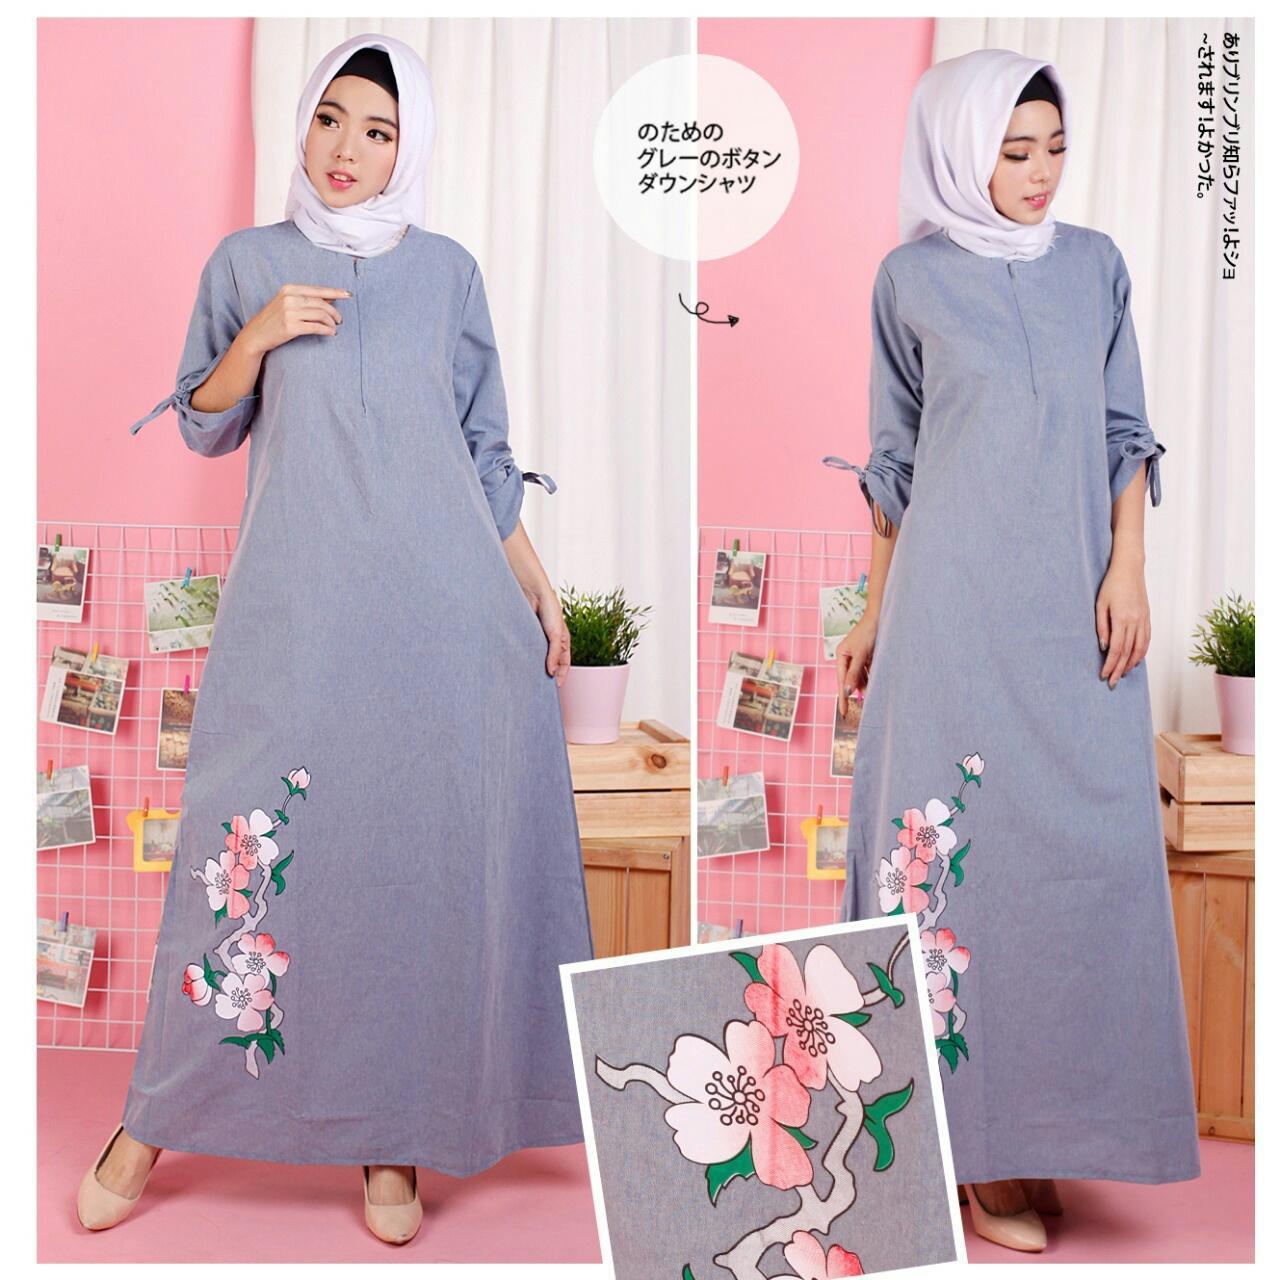 FJCO Renata Maxy / Maxi Dress / Fashion wanita / Fashion MuslimahIDR84900. Rp 85.000